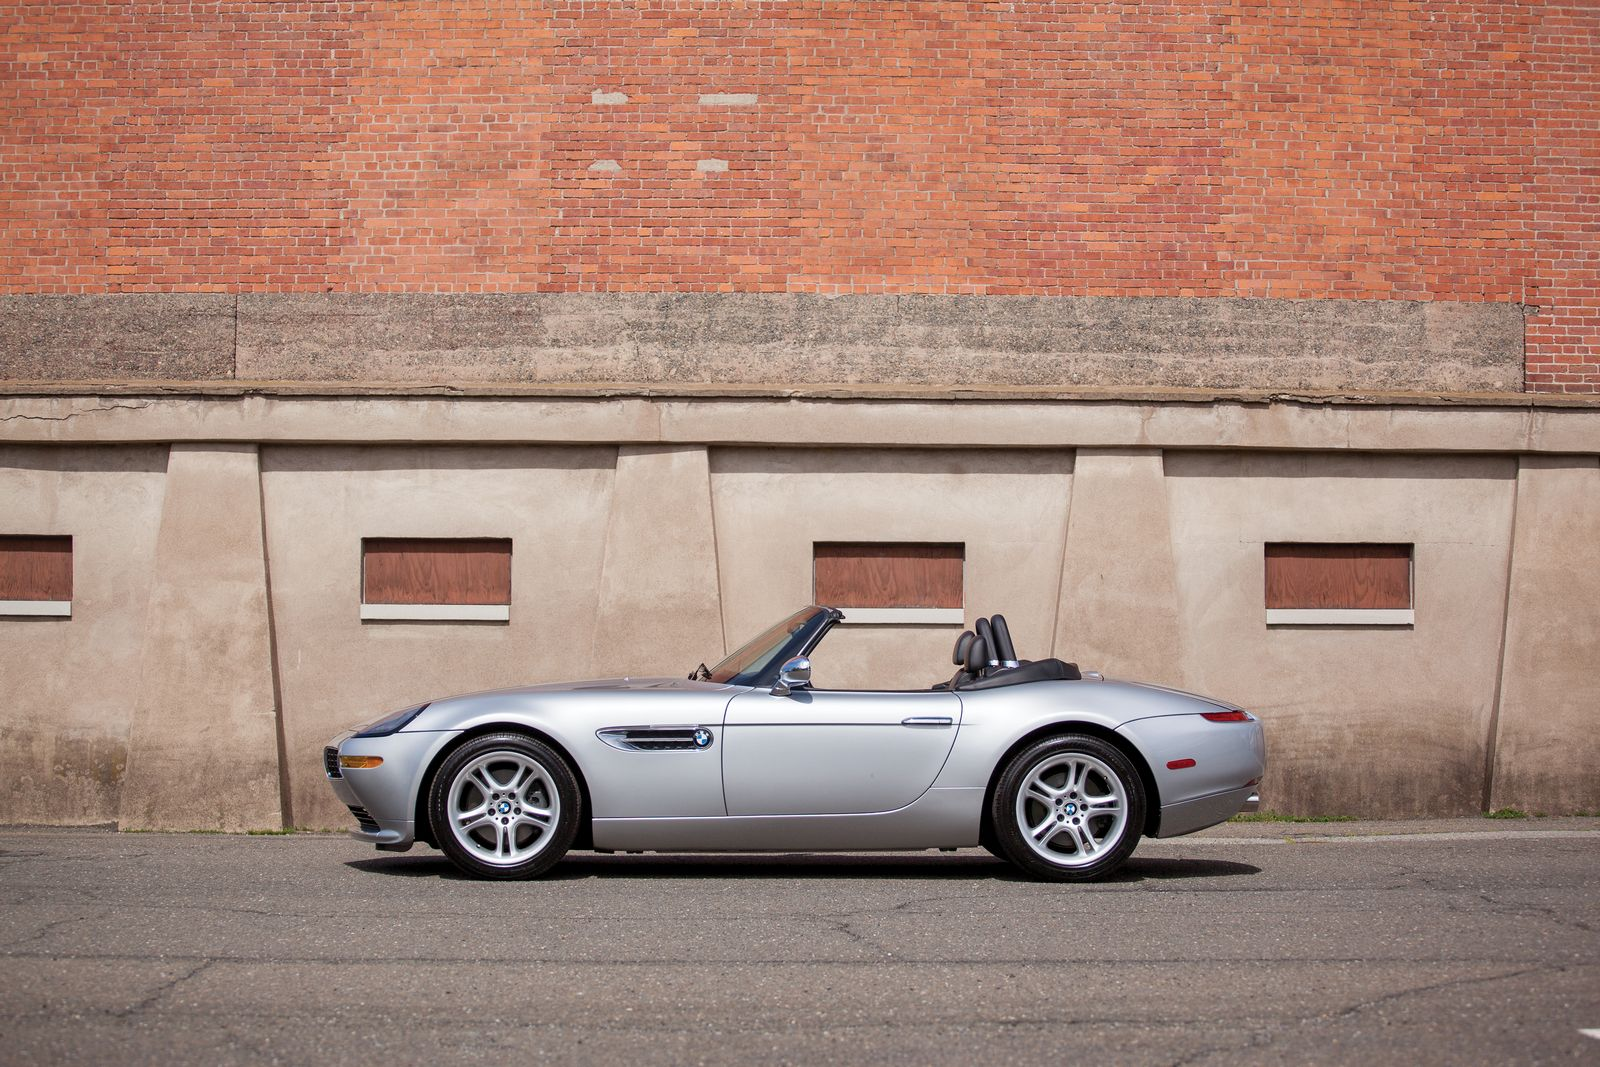 Rm sotheby 39 s motor city auction 2015 preview gtspirit Motor city car auction